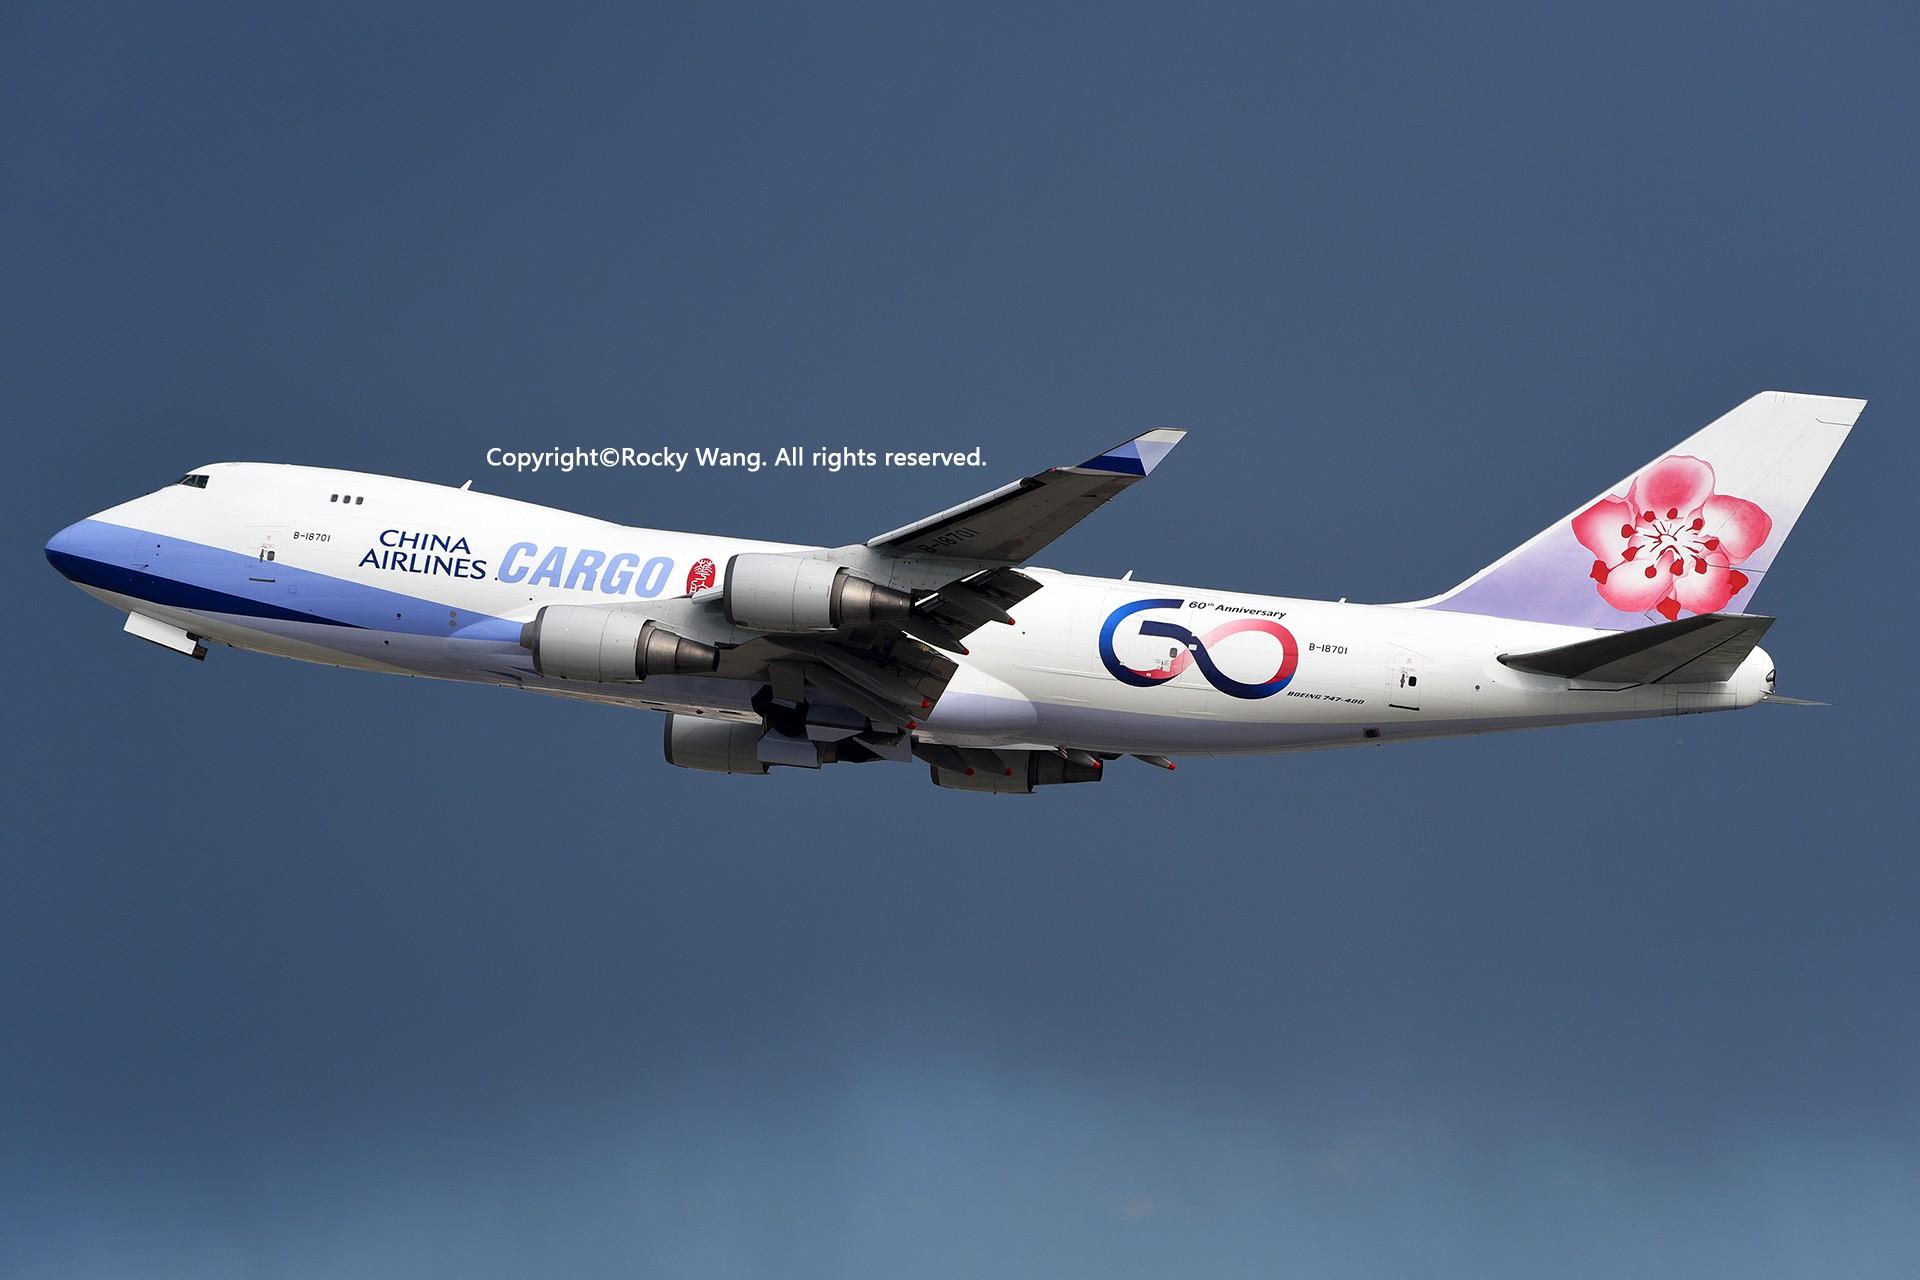 Re:[原创]彩绘圣地-附加彩蛋 BOEING 747-409F(SCD) B-18701 Los Angeles Int'l Airport